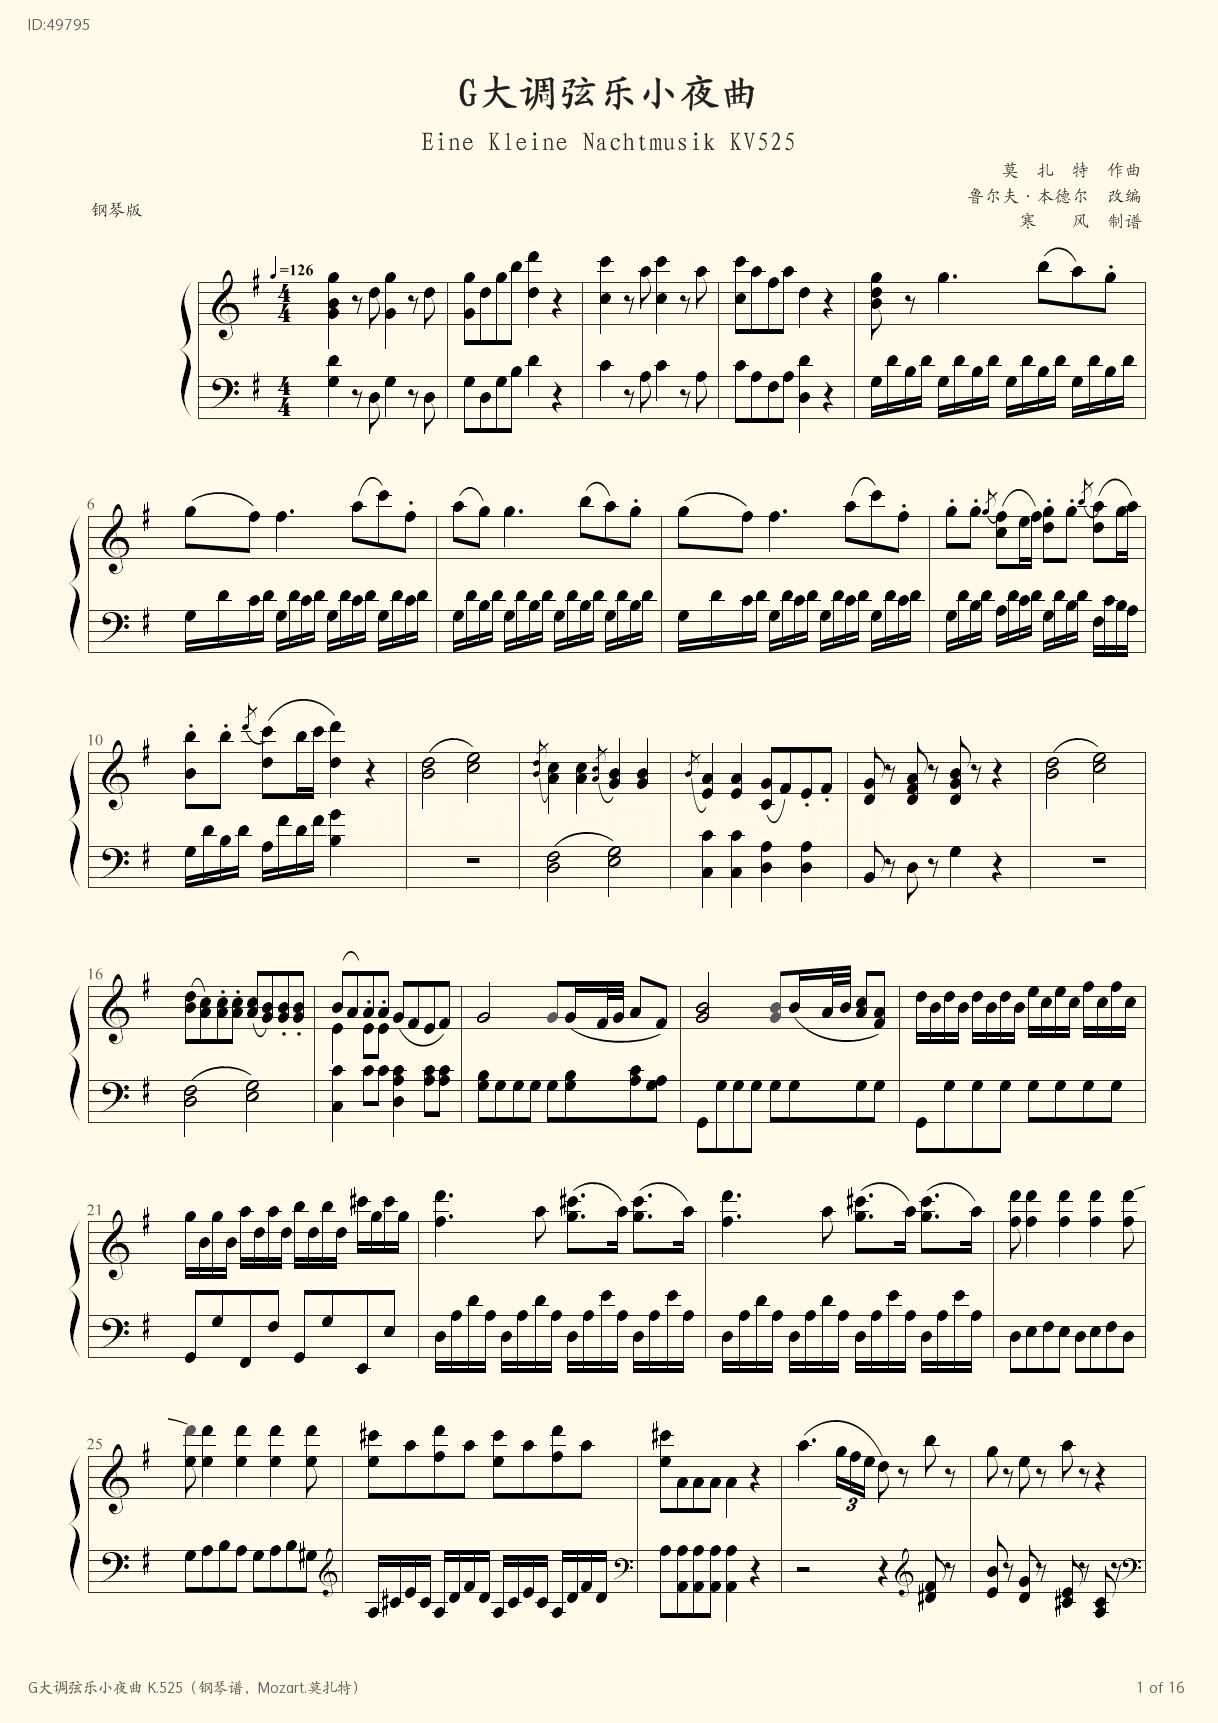 G K 525 Mozart  - Mozart - first page